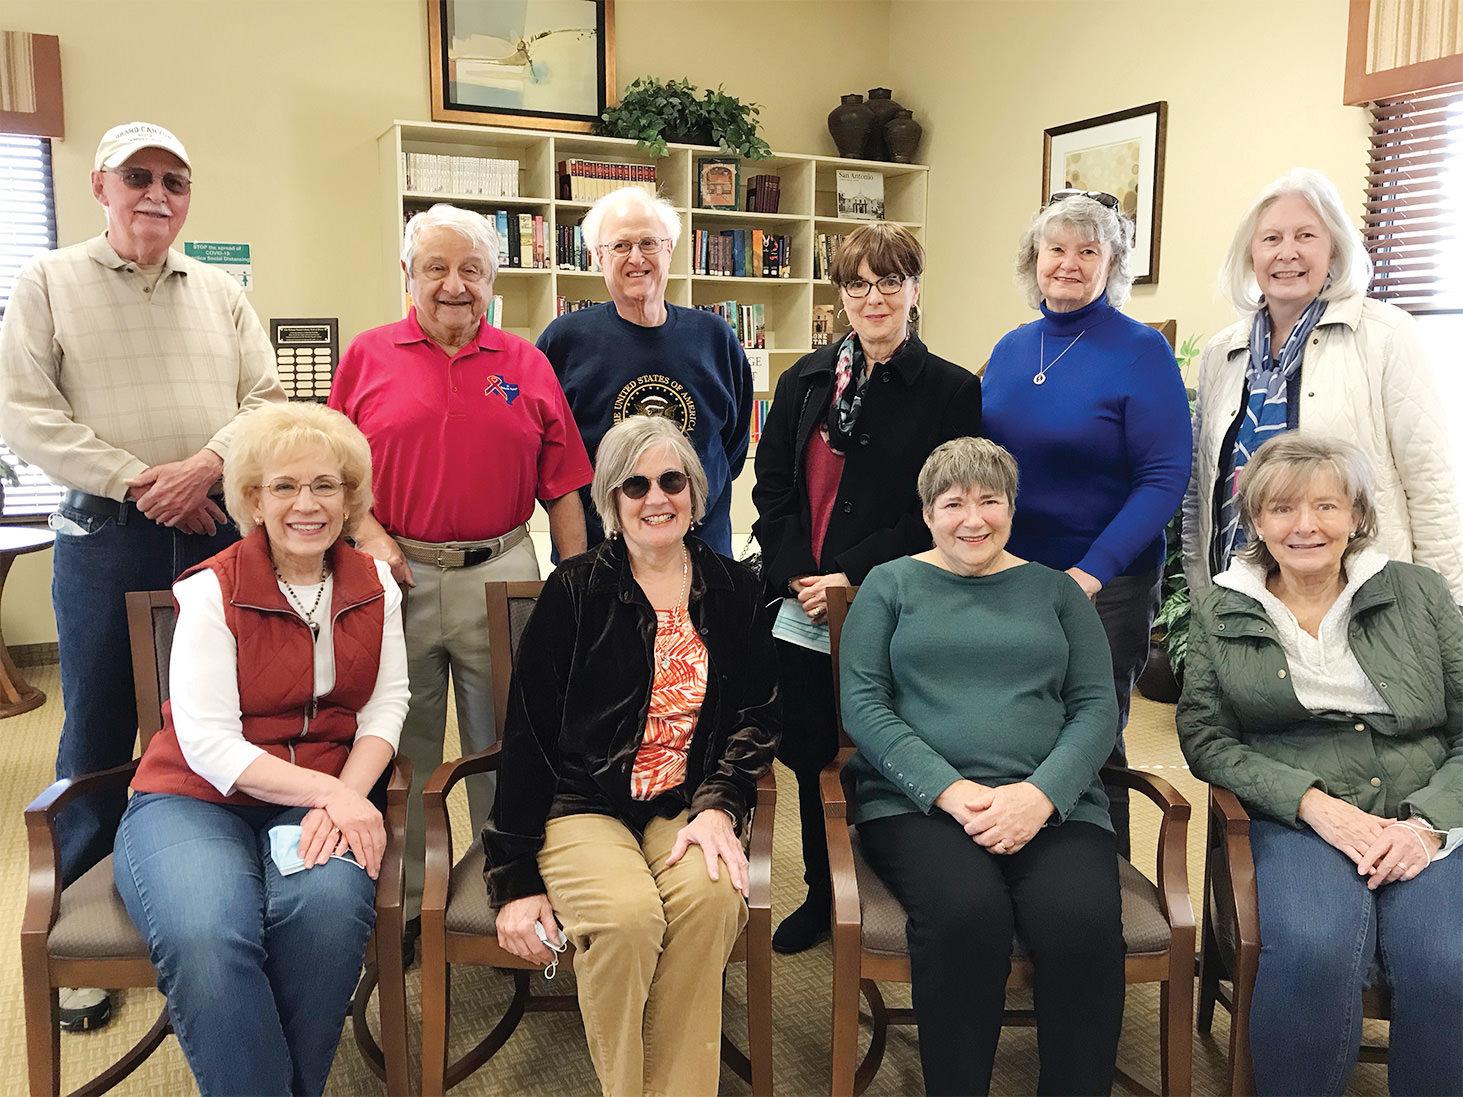 Seated (left to right): Nancy Tarpley, Marcia Elving, Diane van Naerssen, and Sally Ryerson; Standing: Gil Clifton, Fred van Naerssen, Jerry Tarpley, Linda Bono, Doris Koenig, and Joan Pursley.